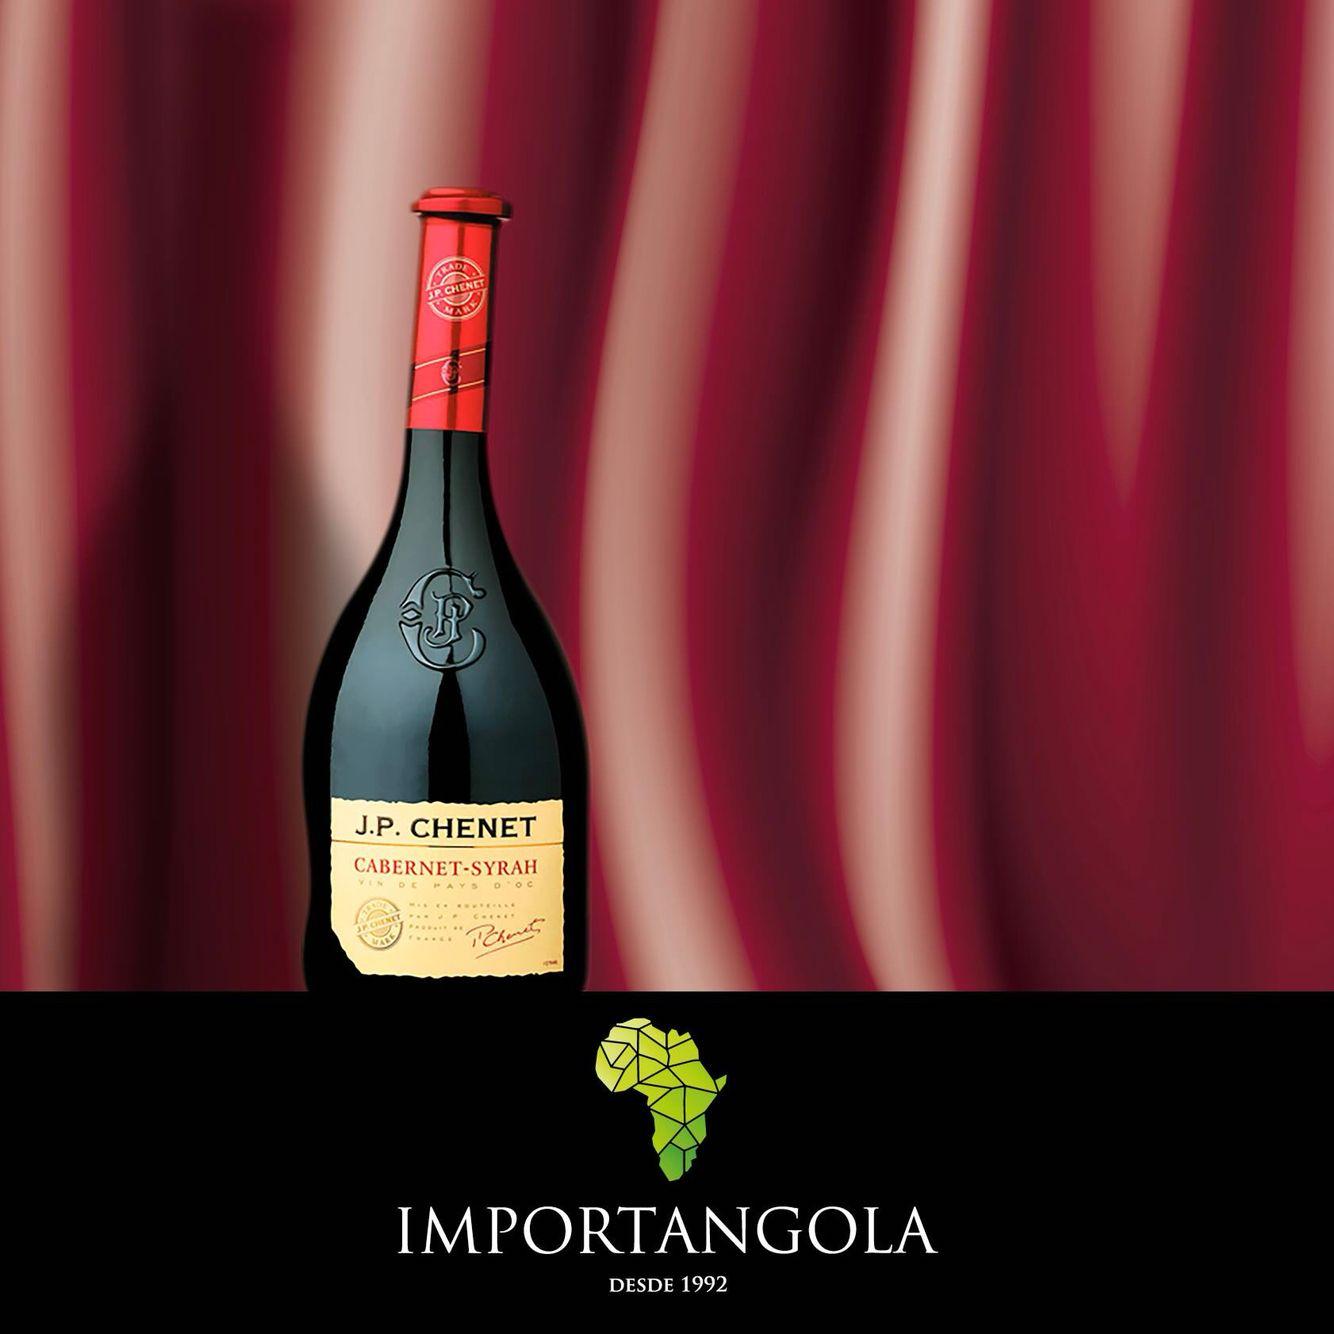 Jp Chenet Wine Bottle Champagne Bottle Alcoholic Drinks